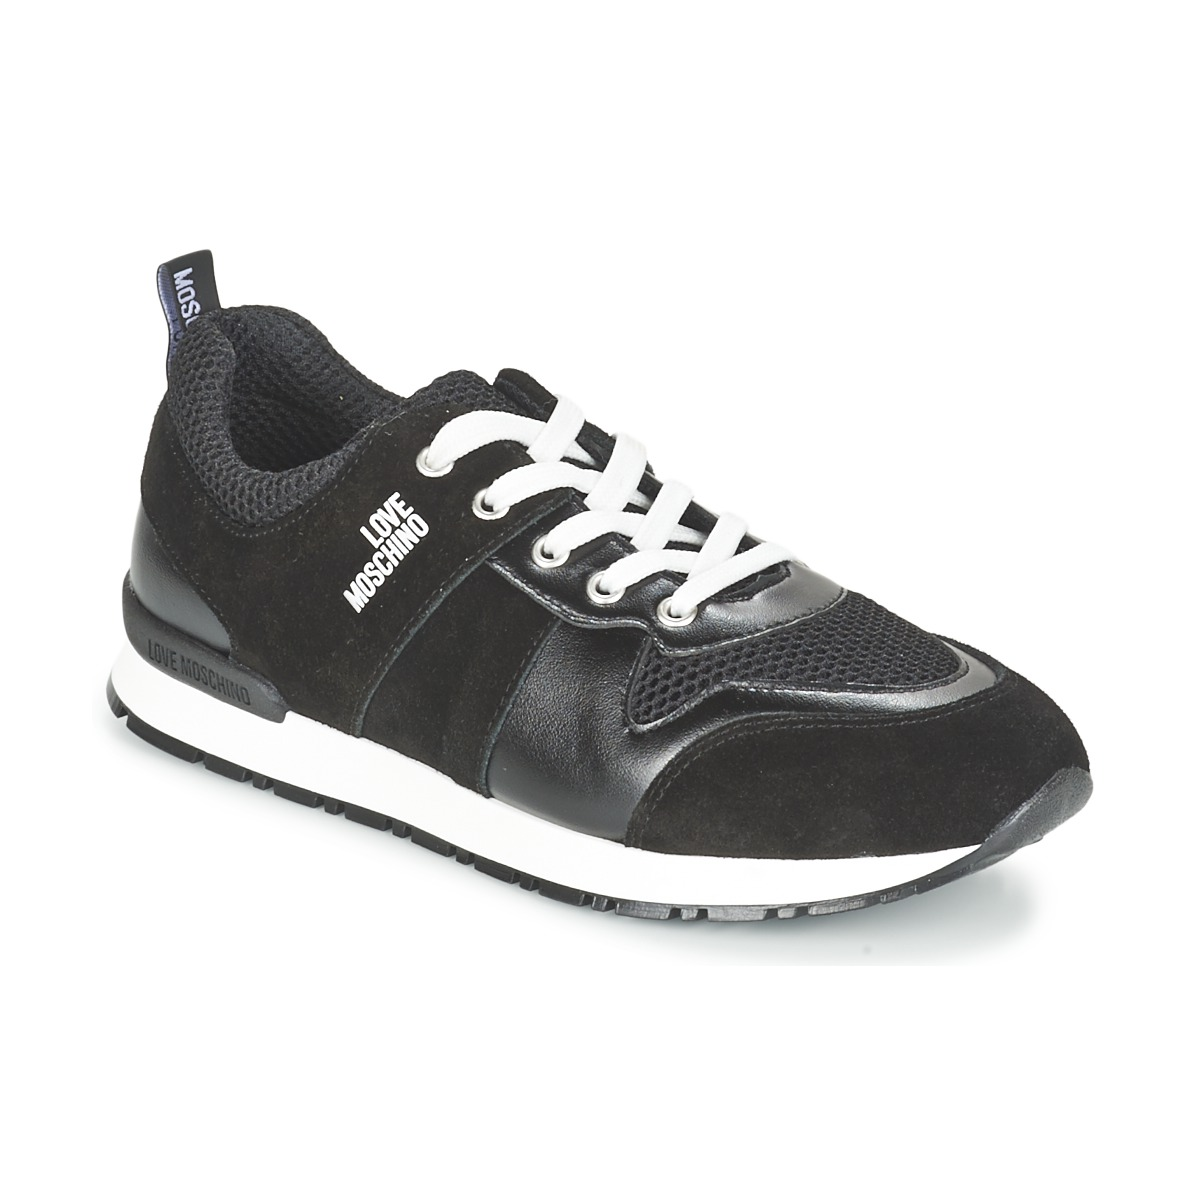 Love Moschino JA15062G13 Schwarz - Kostenloser Versand bei Spartoode ! -  Schuhe Sneaker Low Damen 119 d809237b06